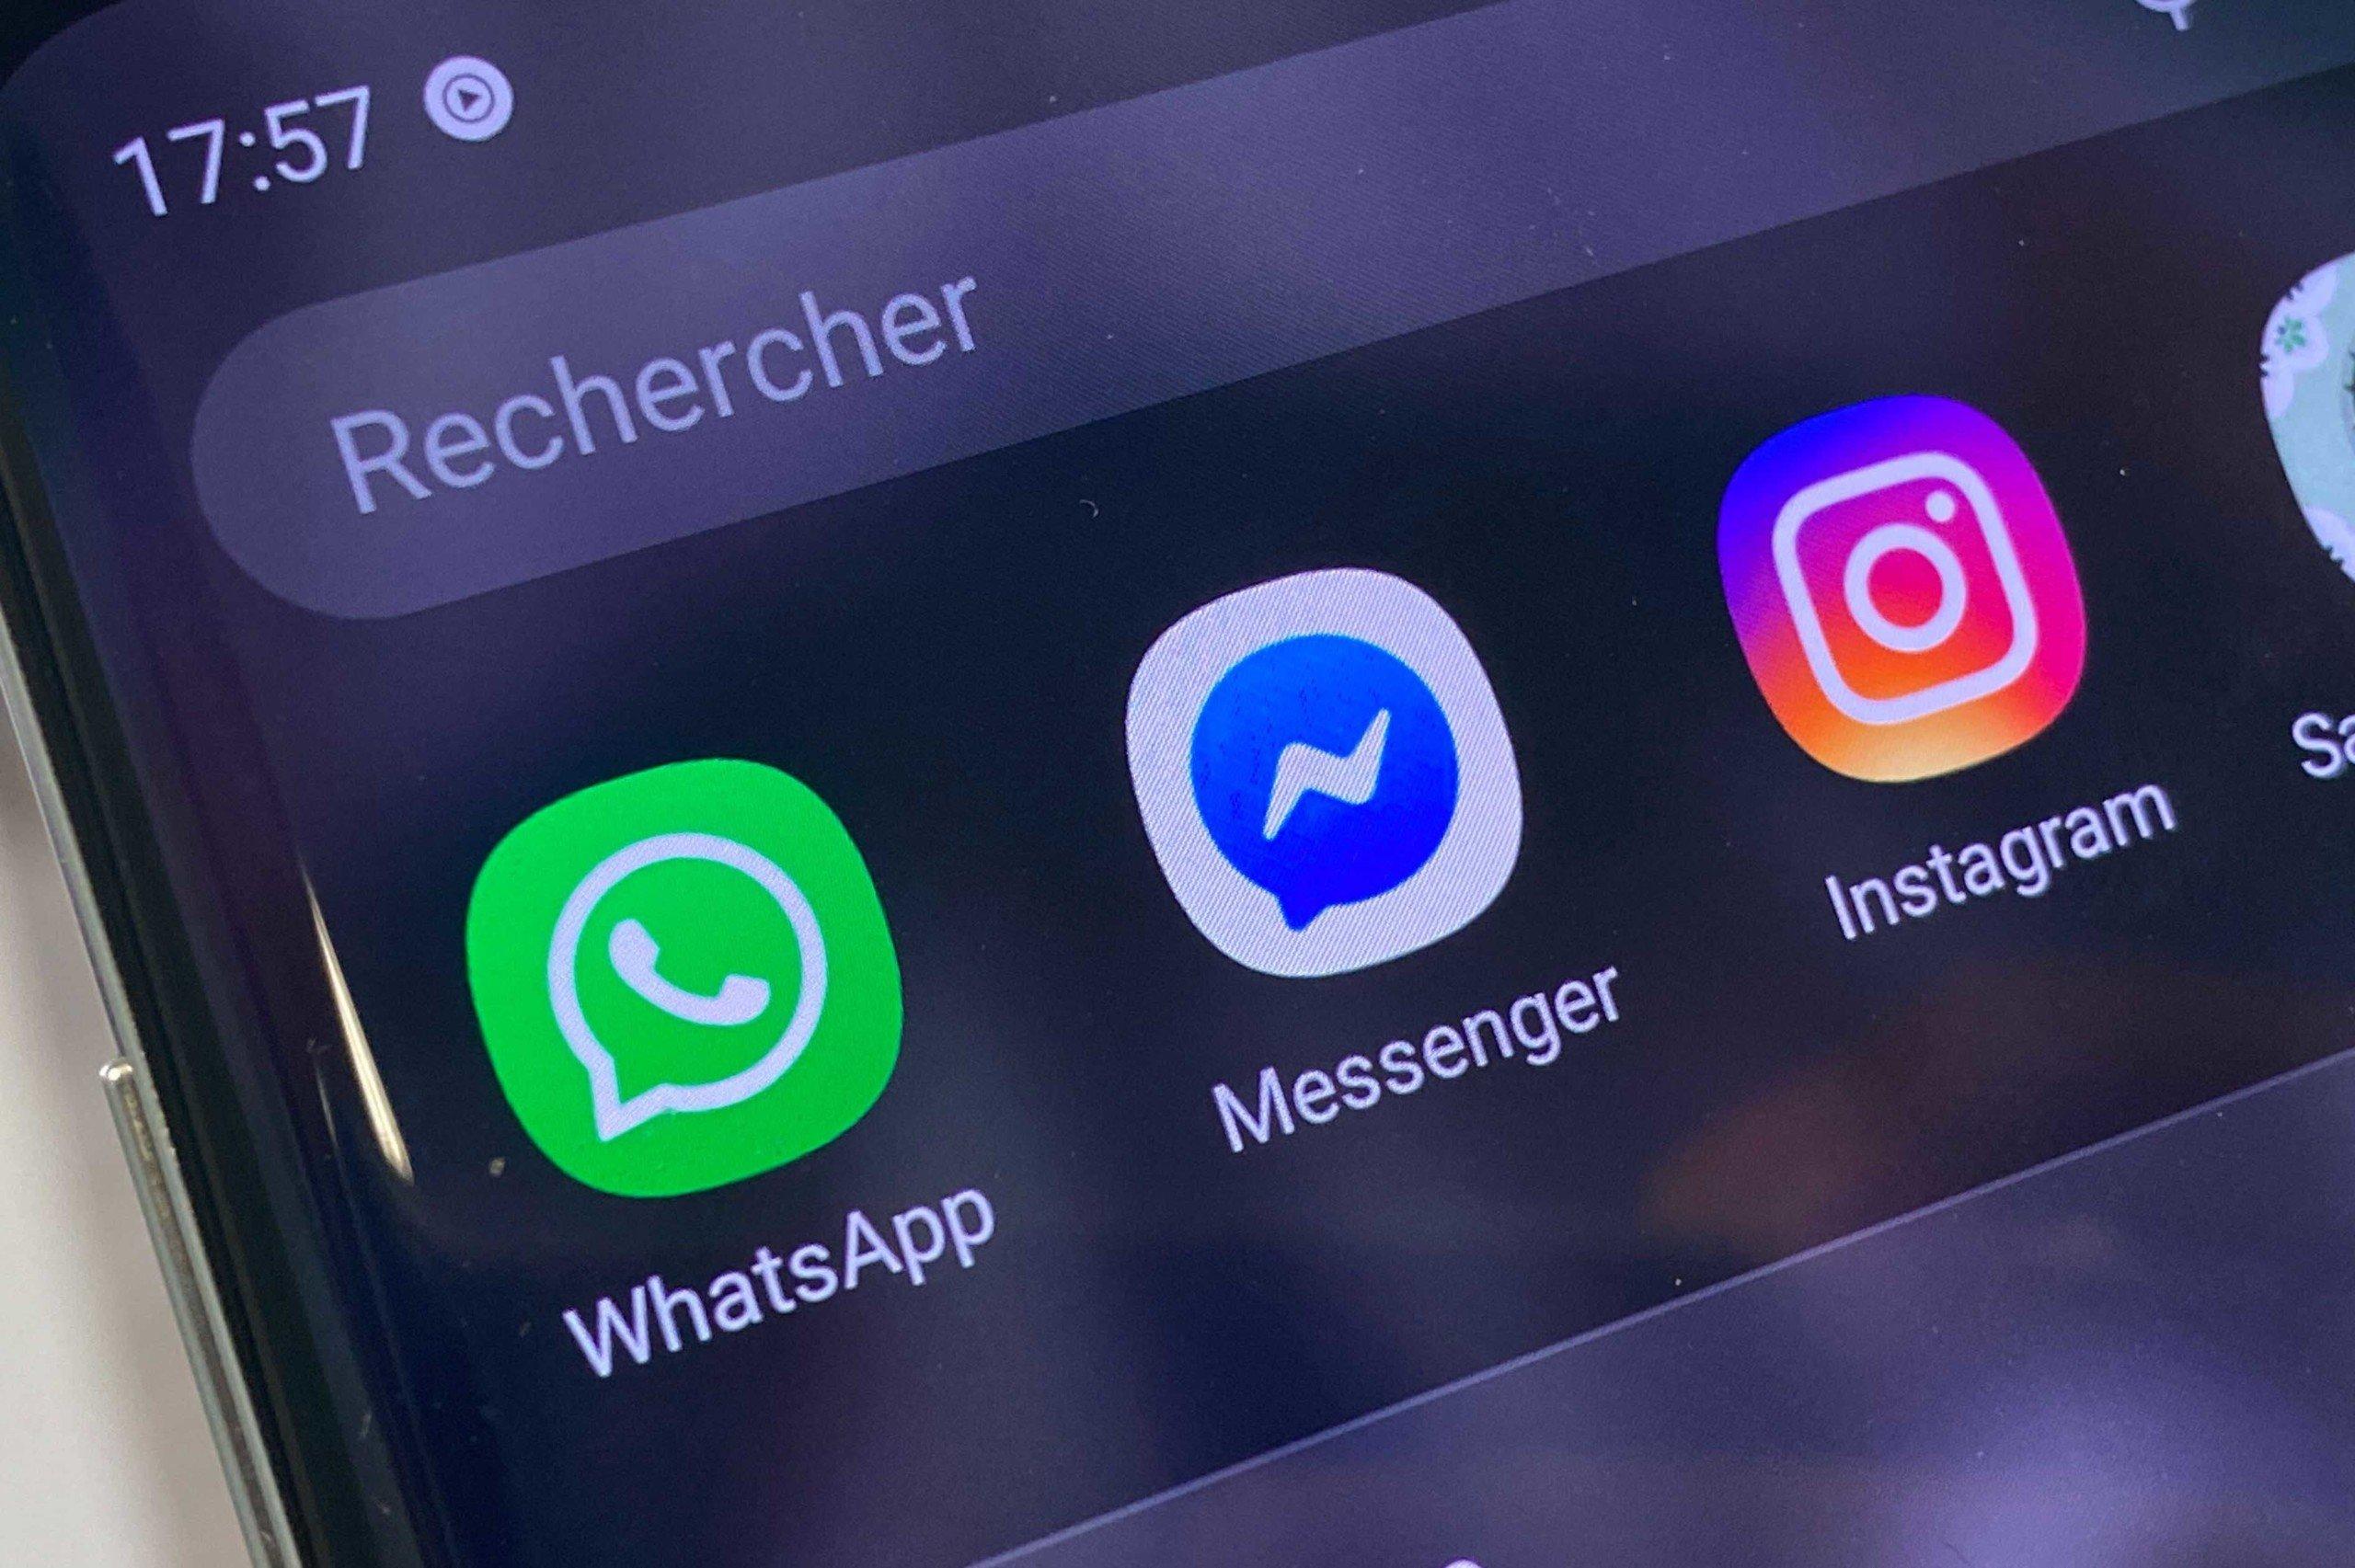 WhatsApp, Messenger and Instagram